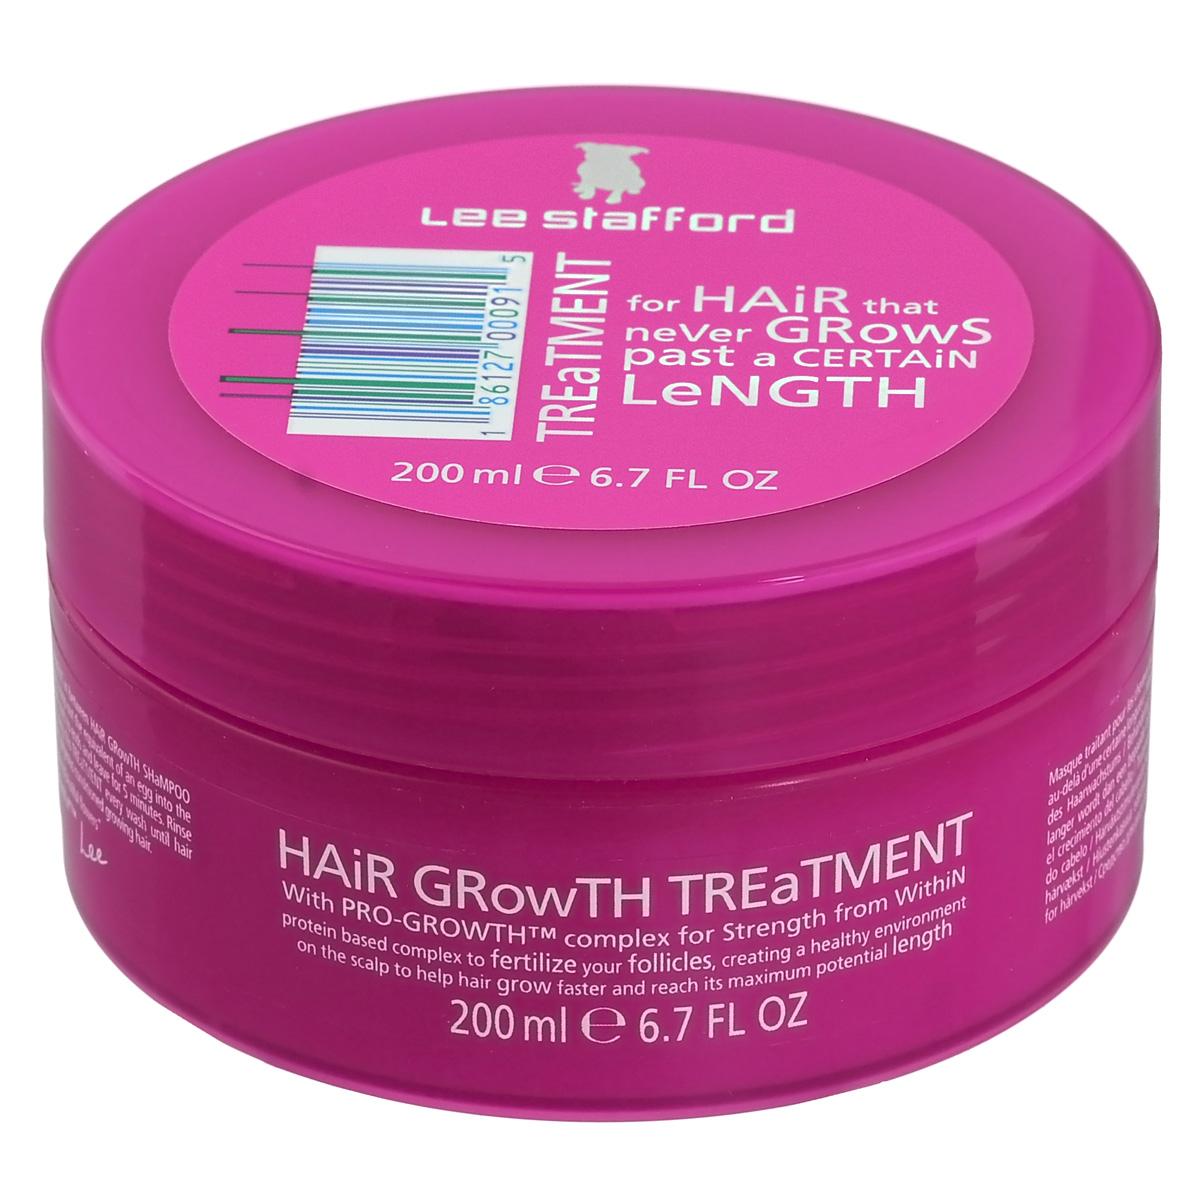 Lee Stafford Маска для роста волос Hair Growth, 200 мл lee stafford шампунь для вьющихся волос here come the curls 250 мл